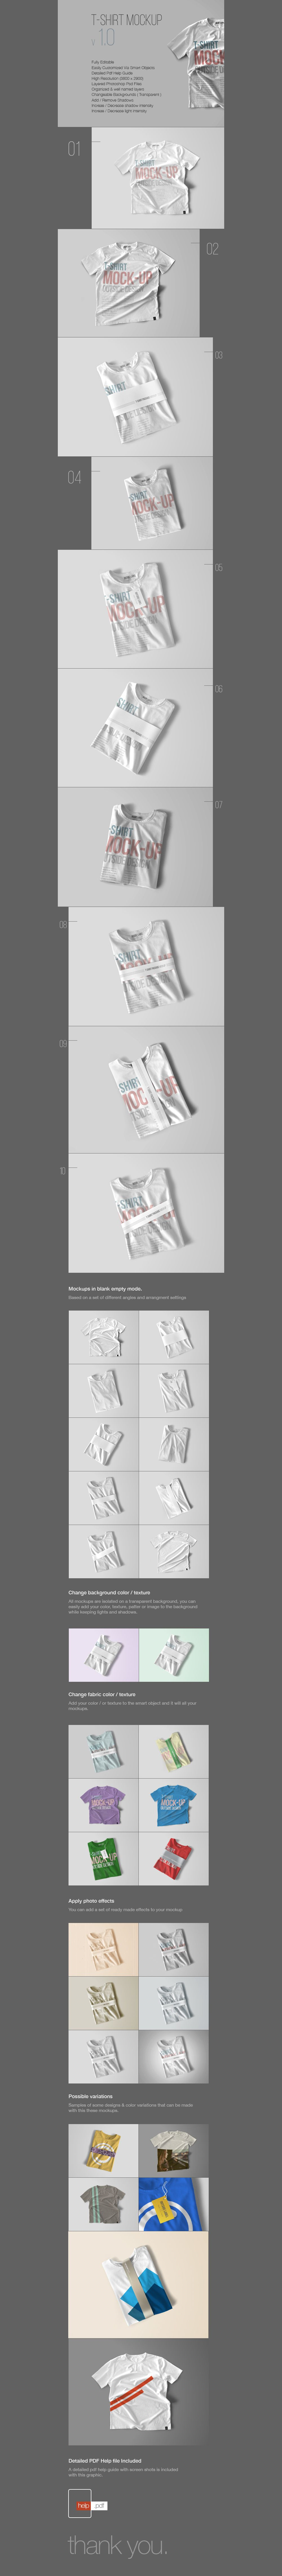 Free PSD T-Shirt Mockup Template (96 MB) | themeraid.com | #free ...